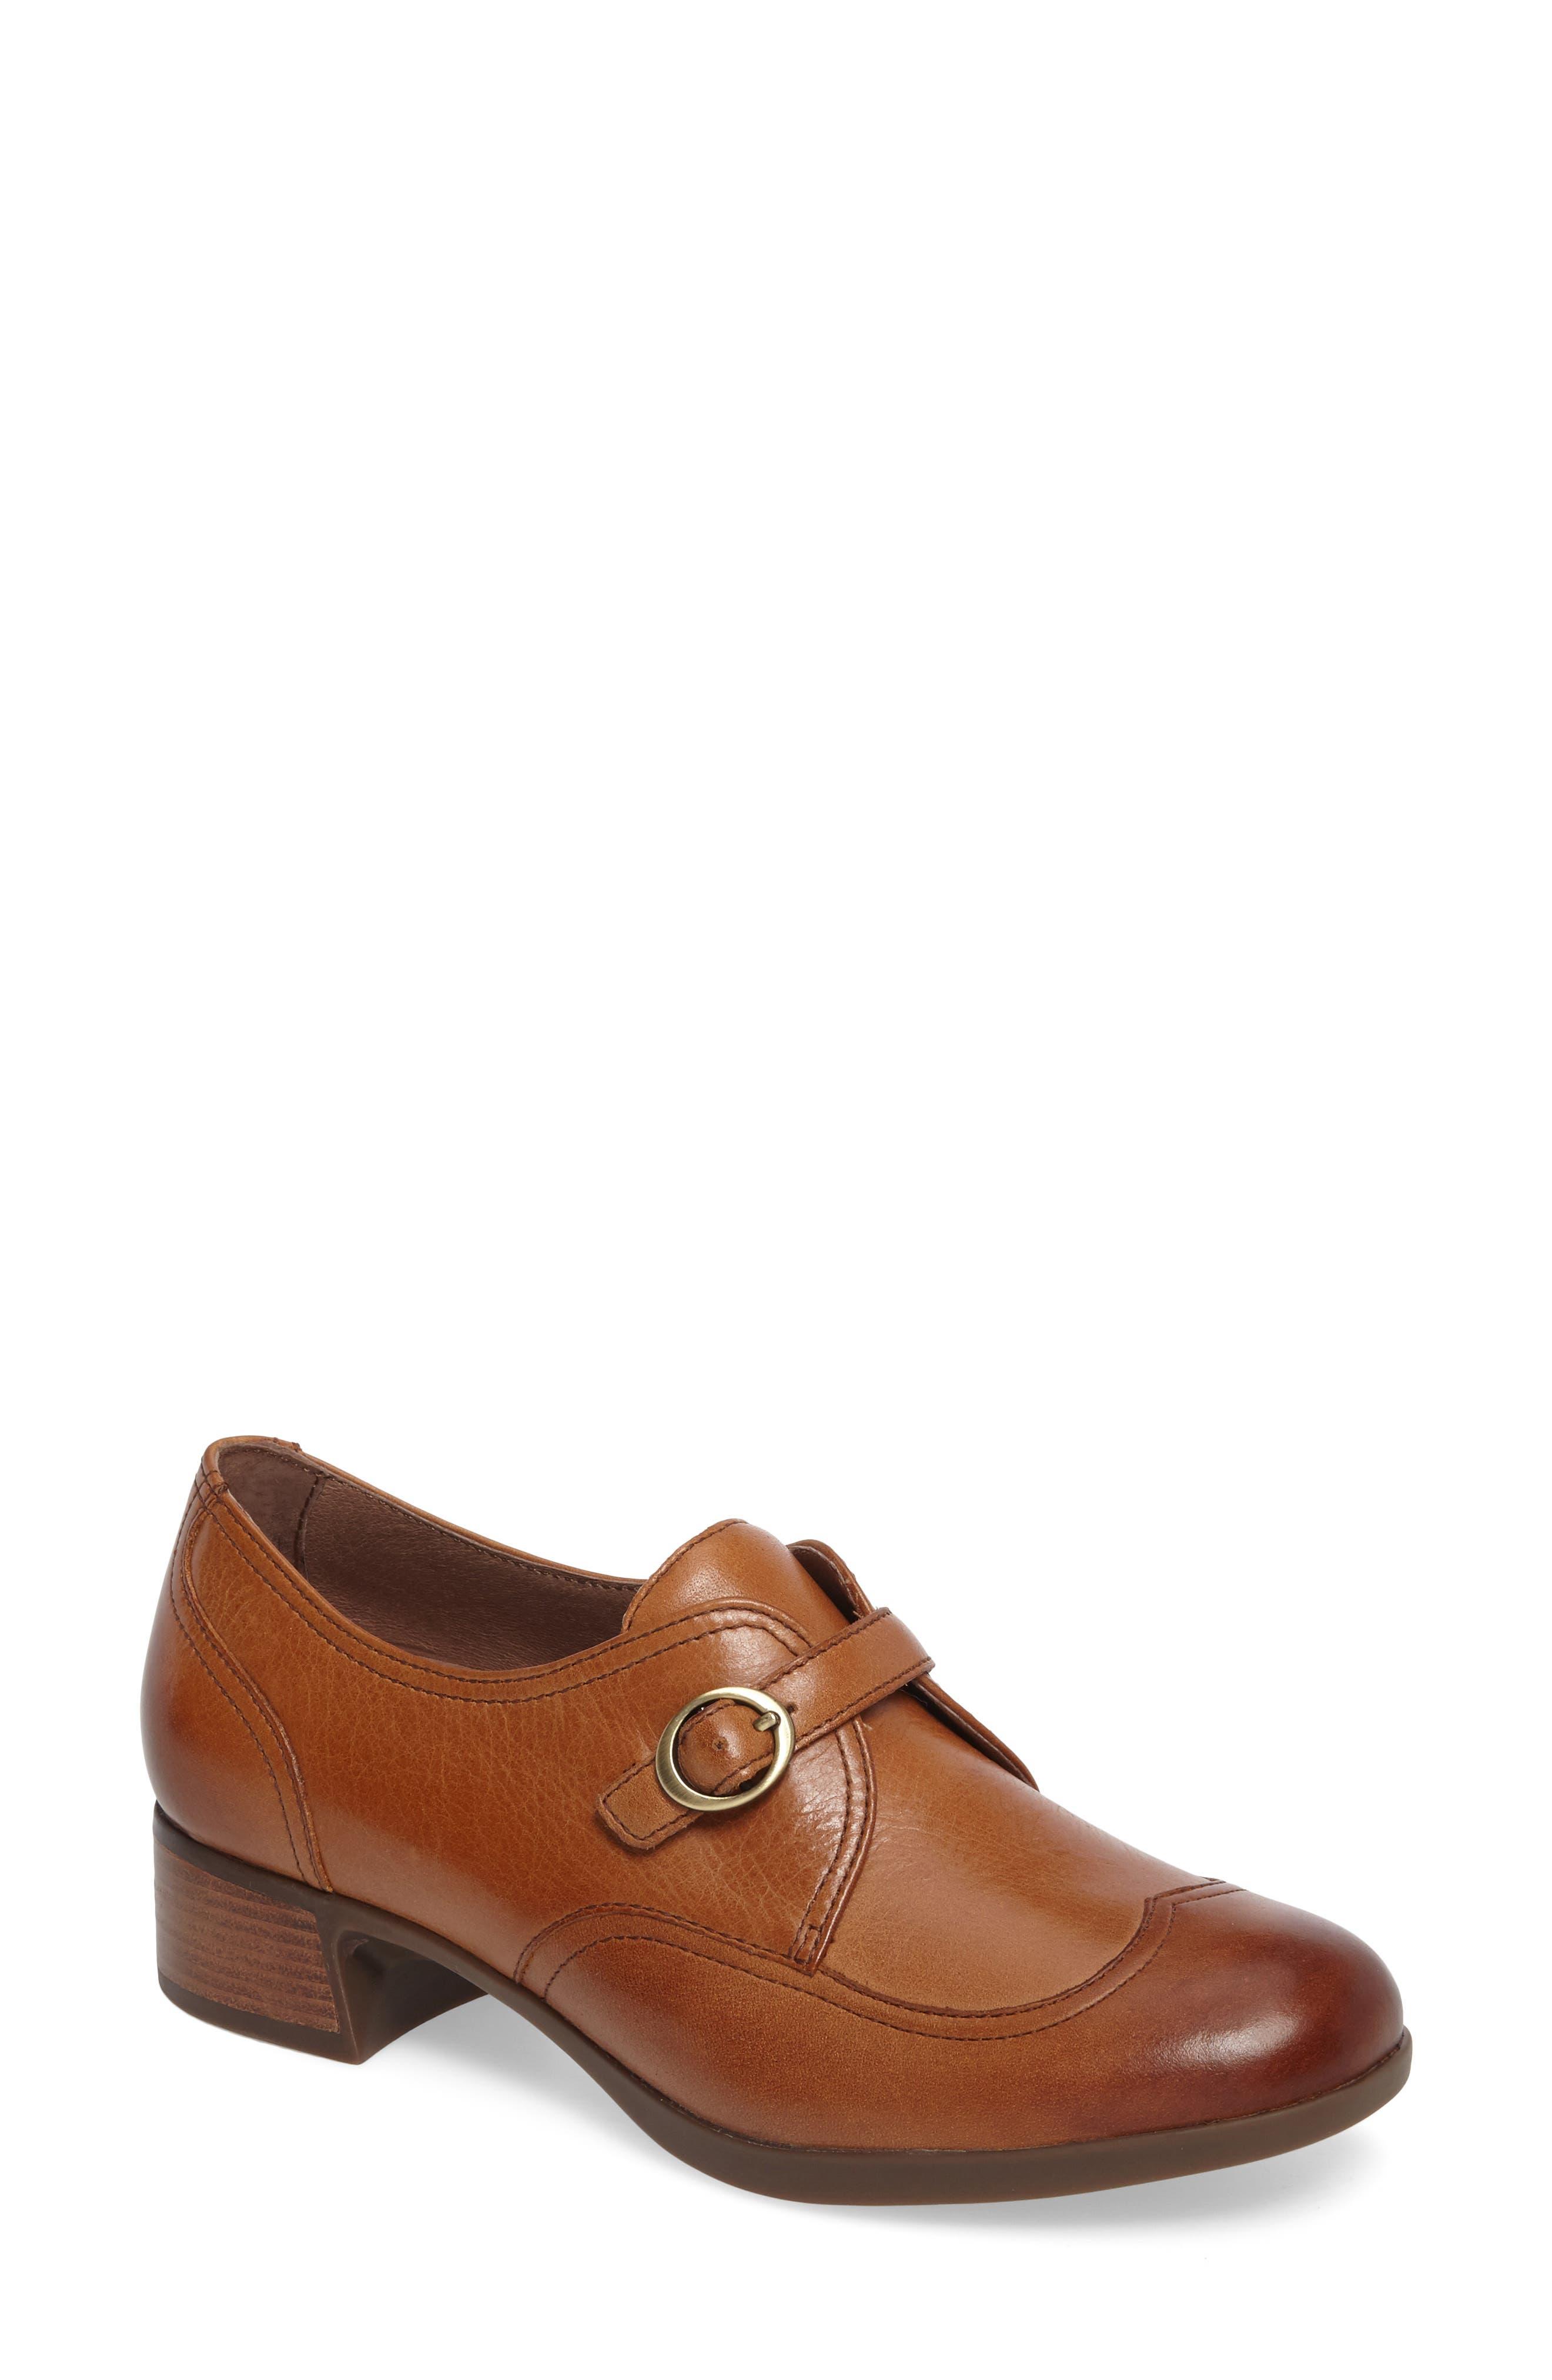 Livie Wingtip Oxford,                         Main,                         color, Saddle Burnished Nappa Leather